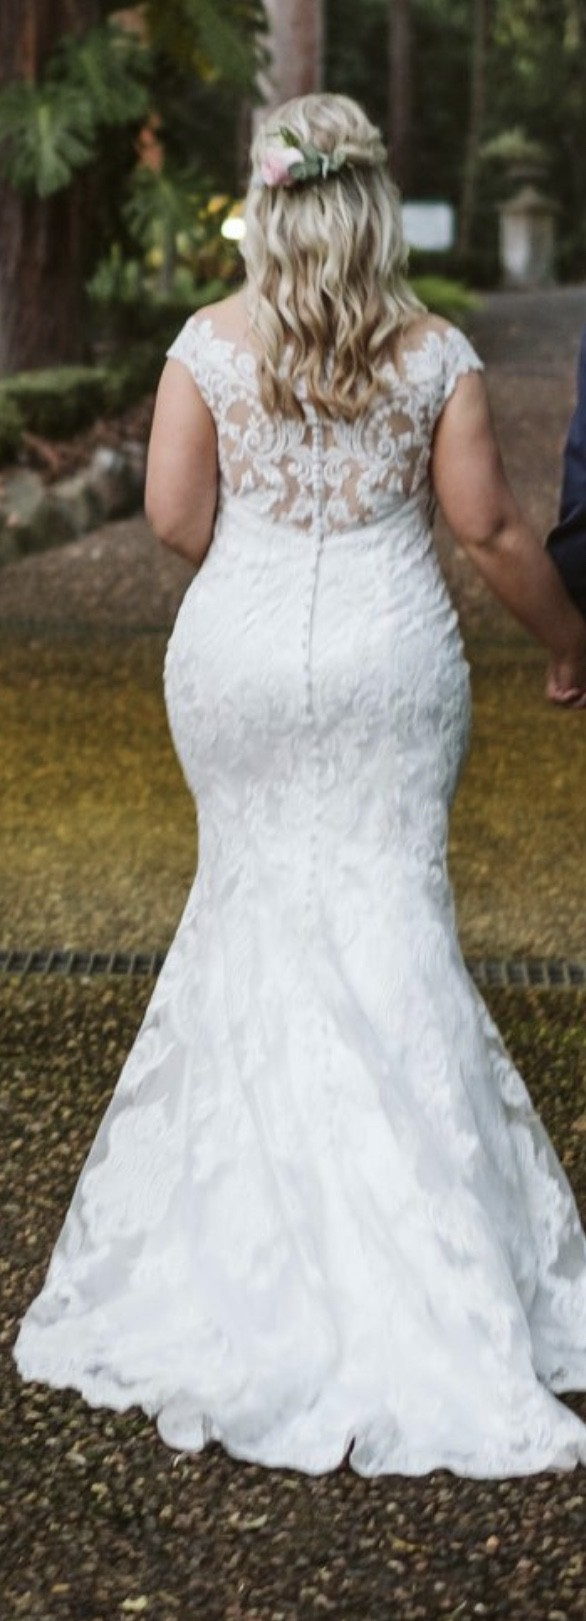 Allure Bridals, 9474